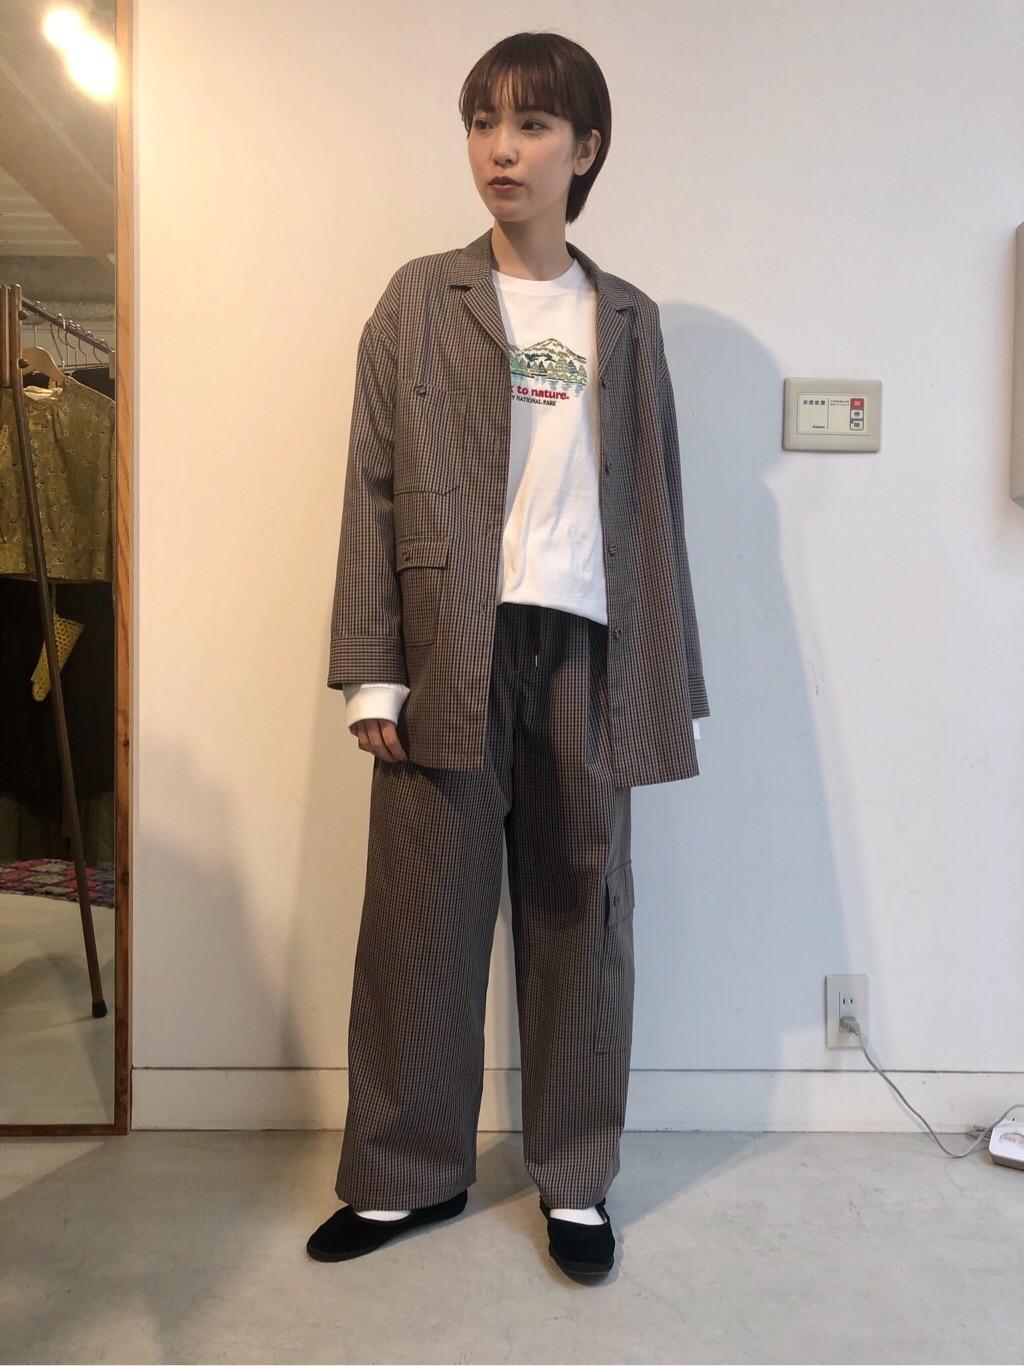 l'atelier du savon 名古屋栄路面 身長:161cm 2020.03.07